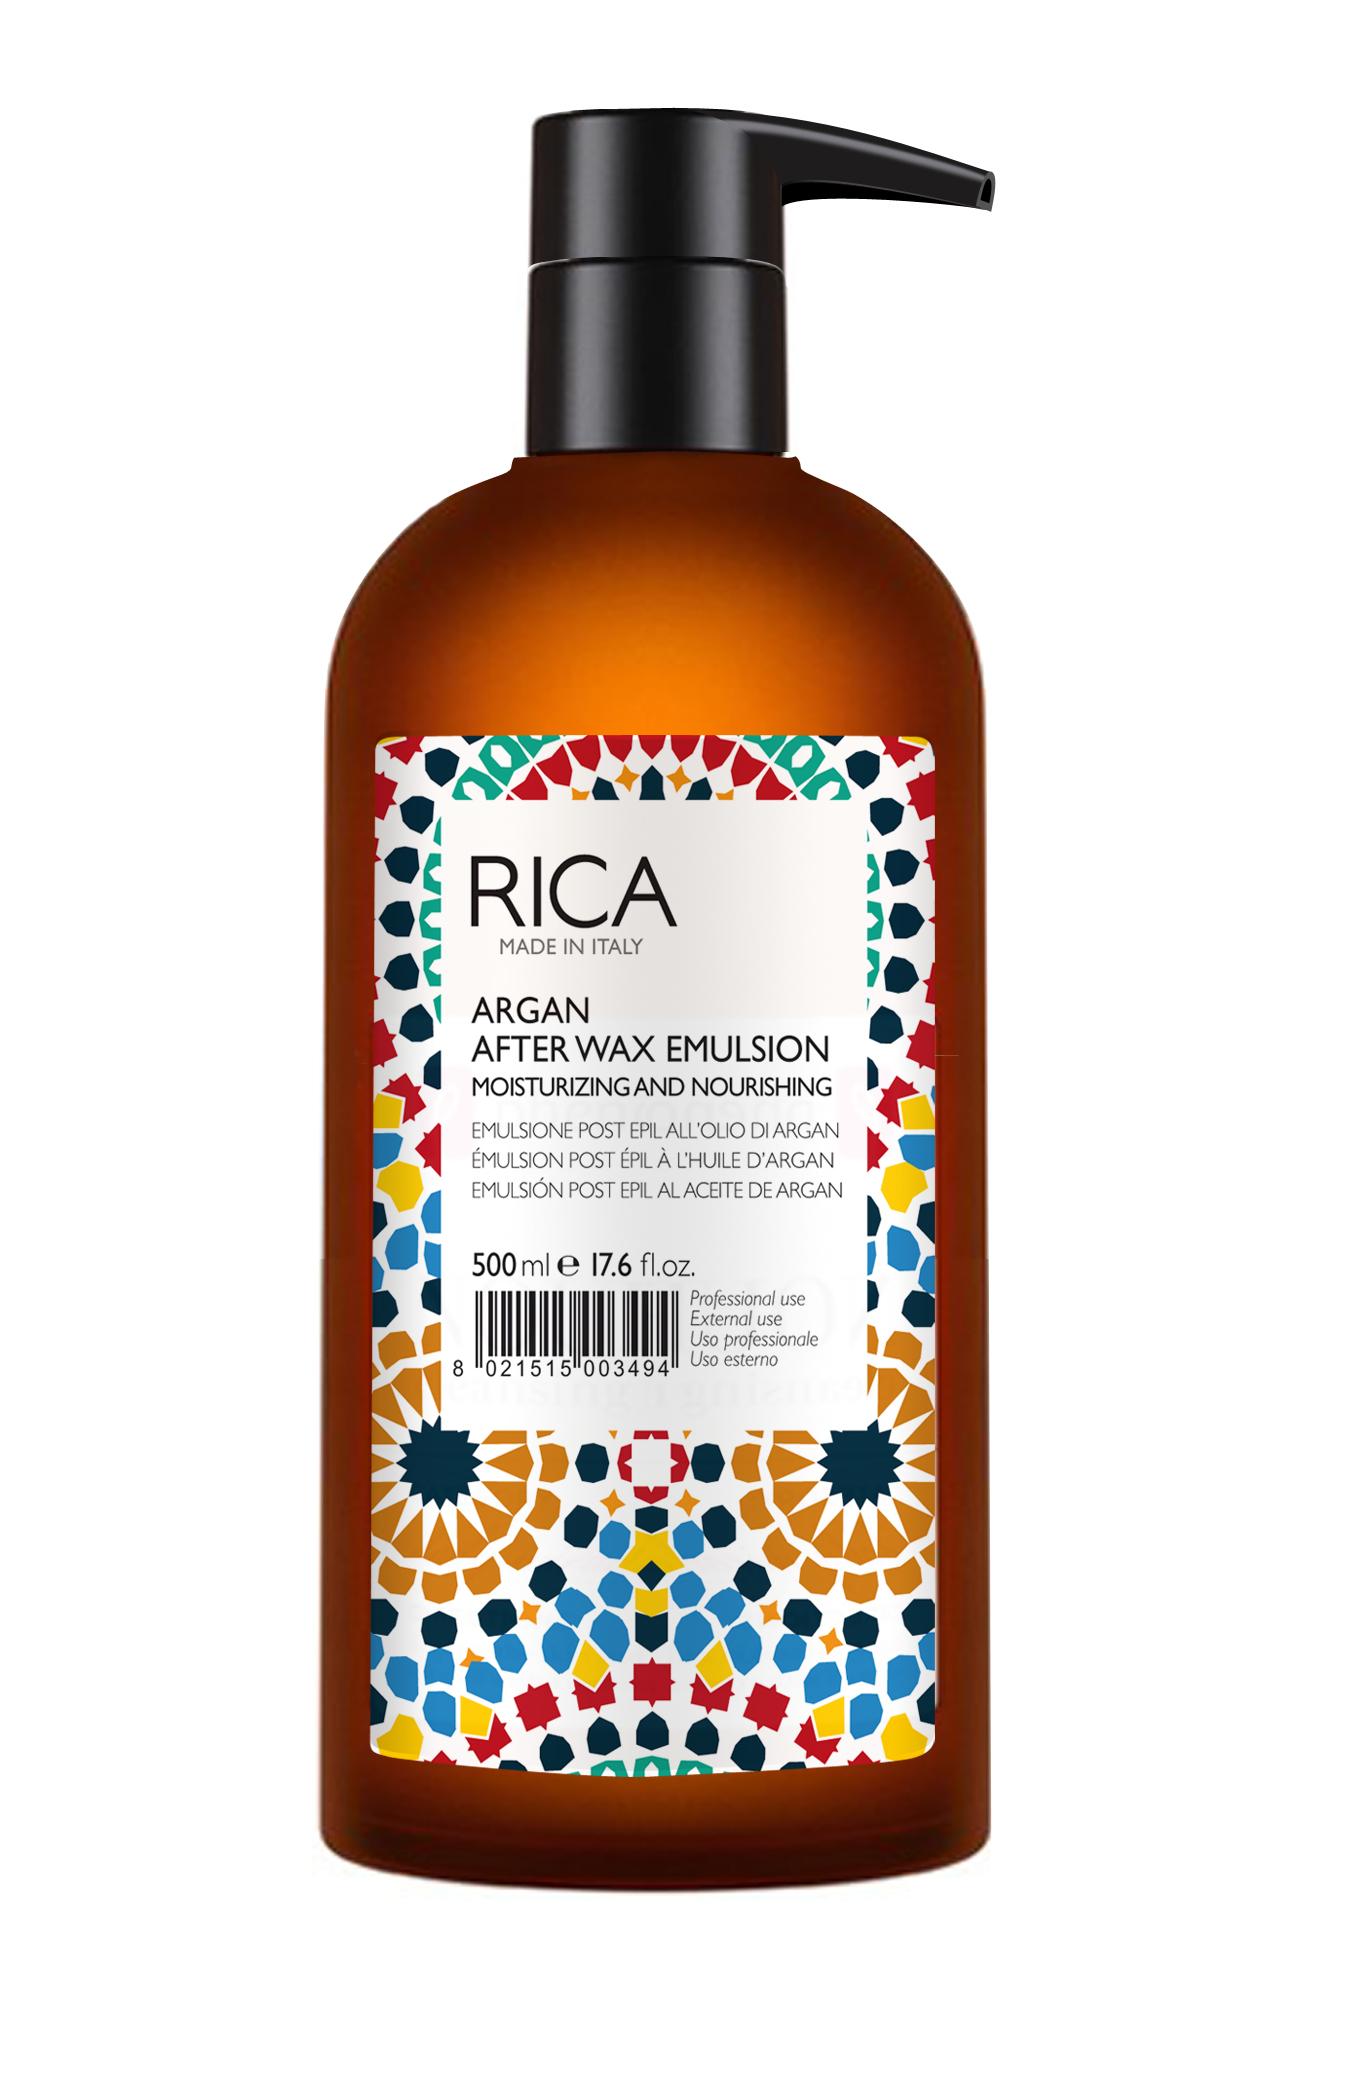 RICA - ARGAN OIL AFTER WAX EMULSION 500ml